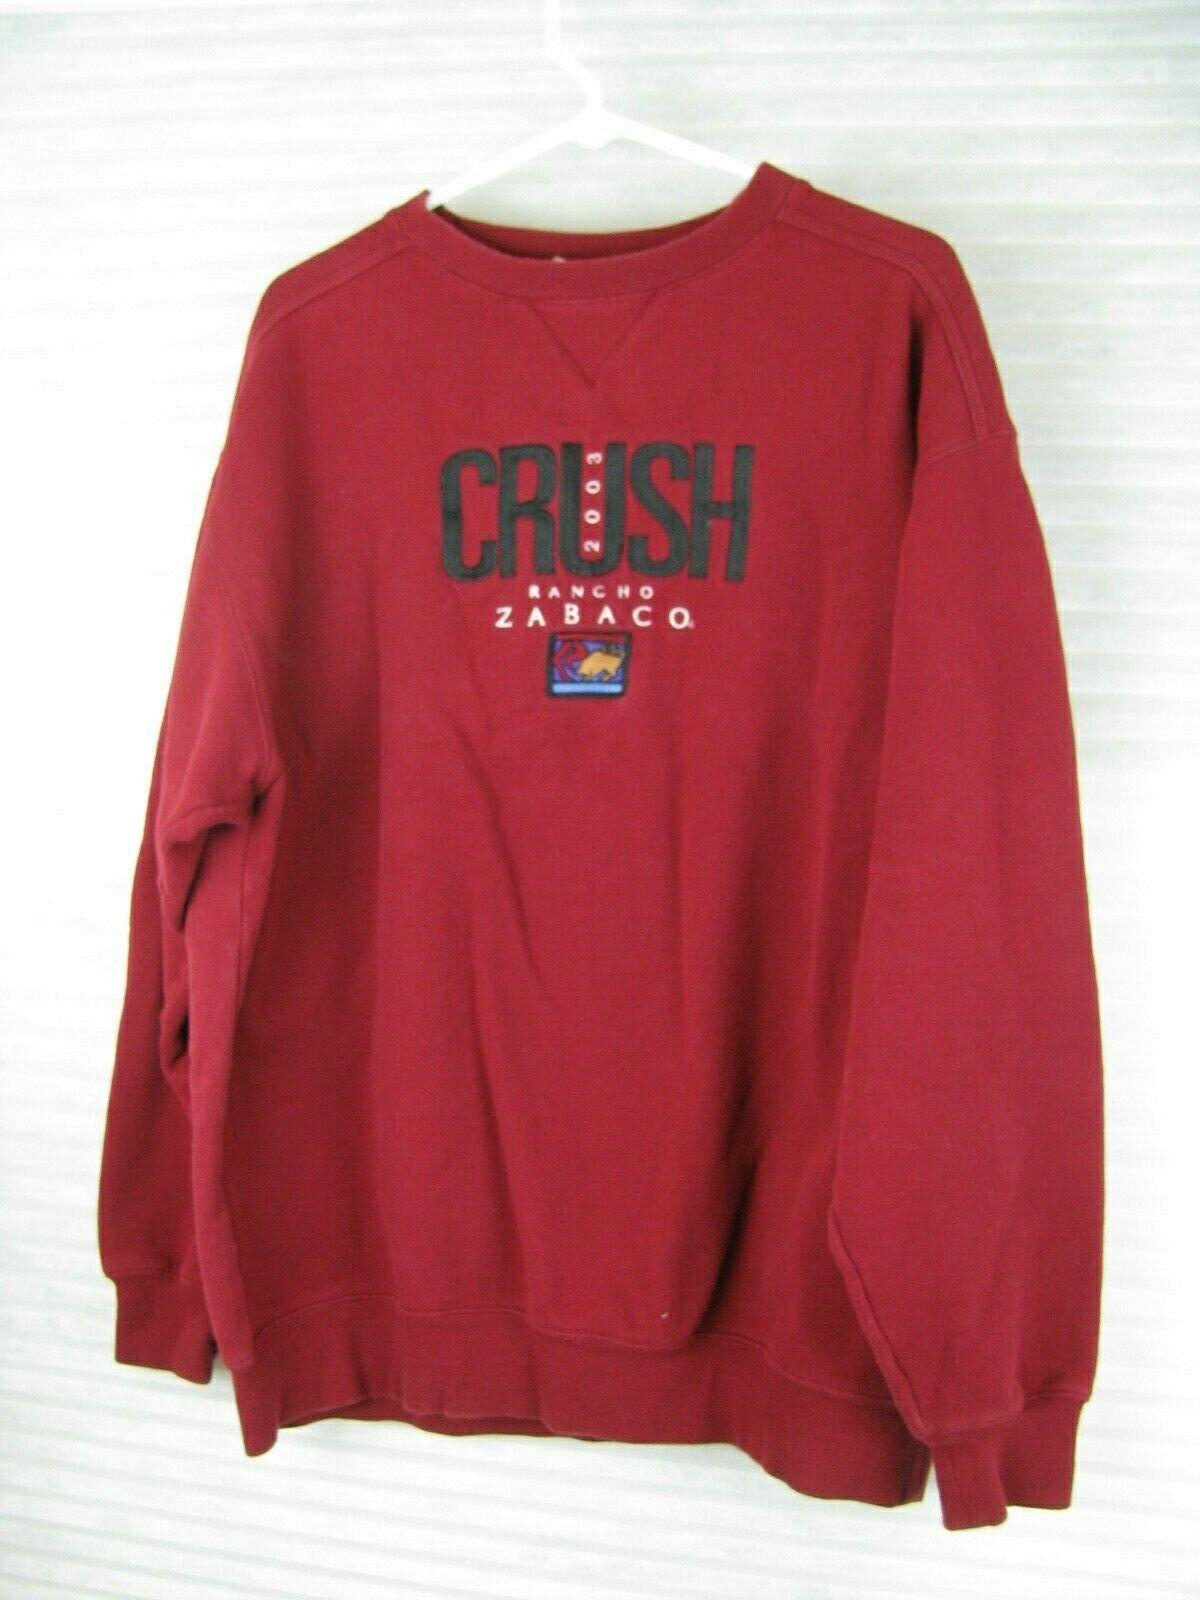 Lee Sueded Dallas Rancho Zabaco Winery Crush Mens Red Crewneck Sweatshirt Large